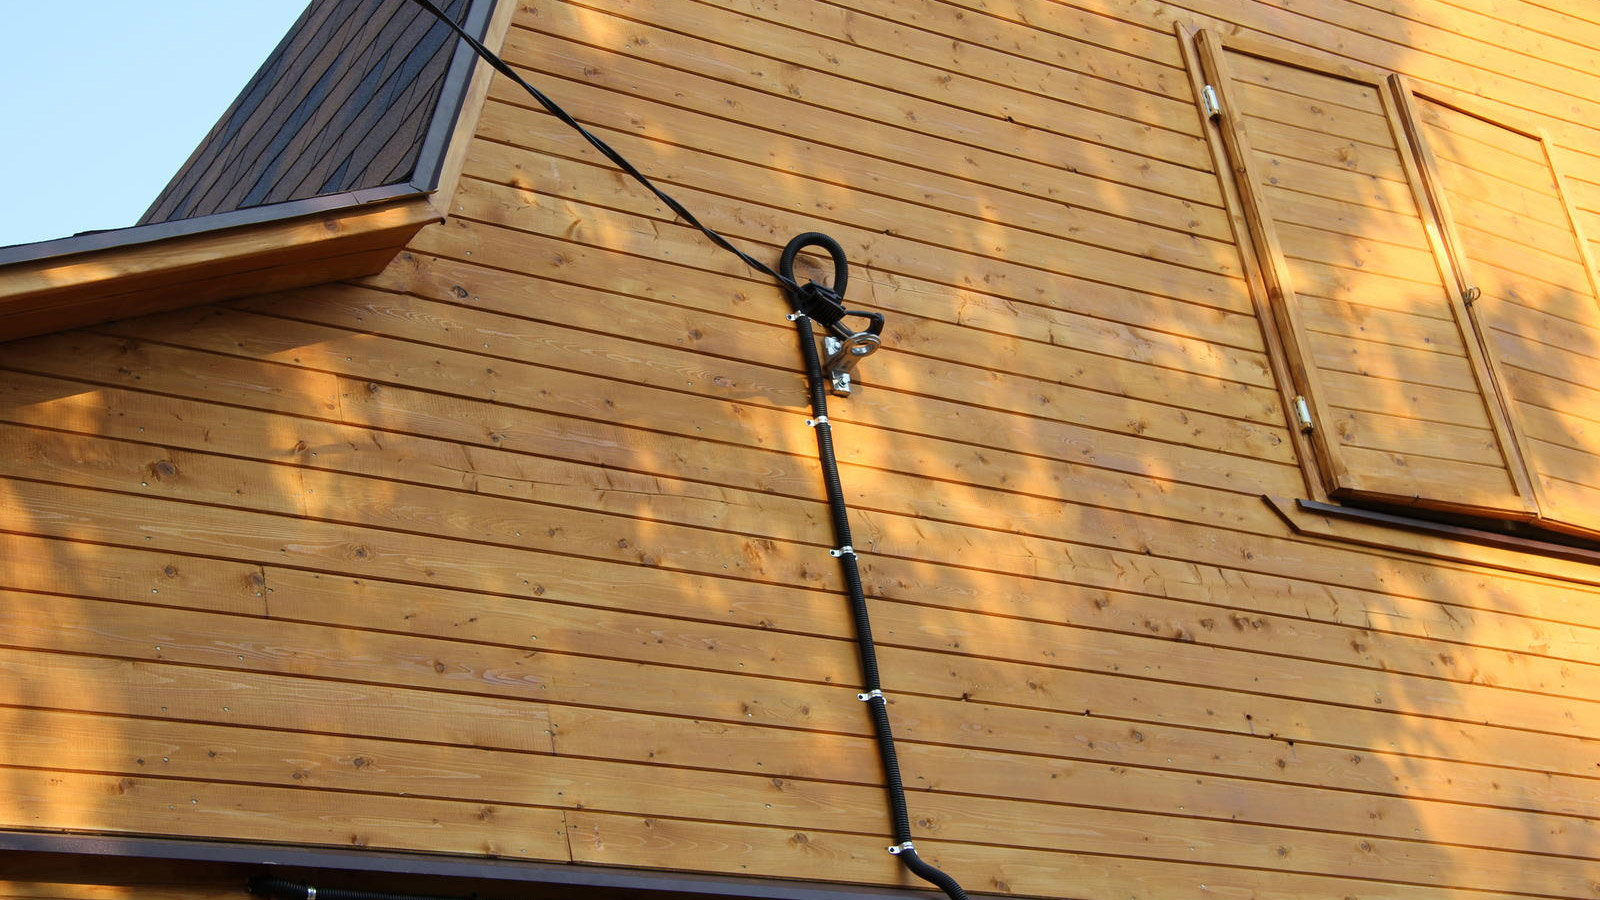 Фото подсоединения проводов от столба к дому